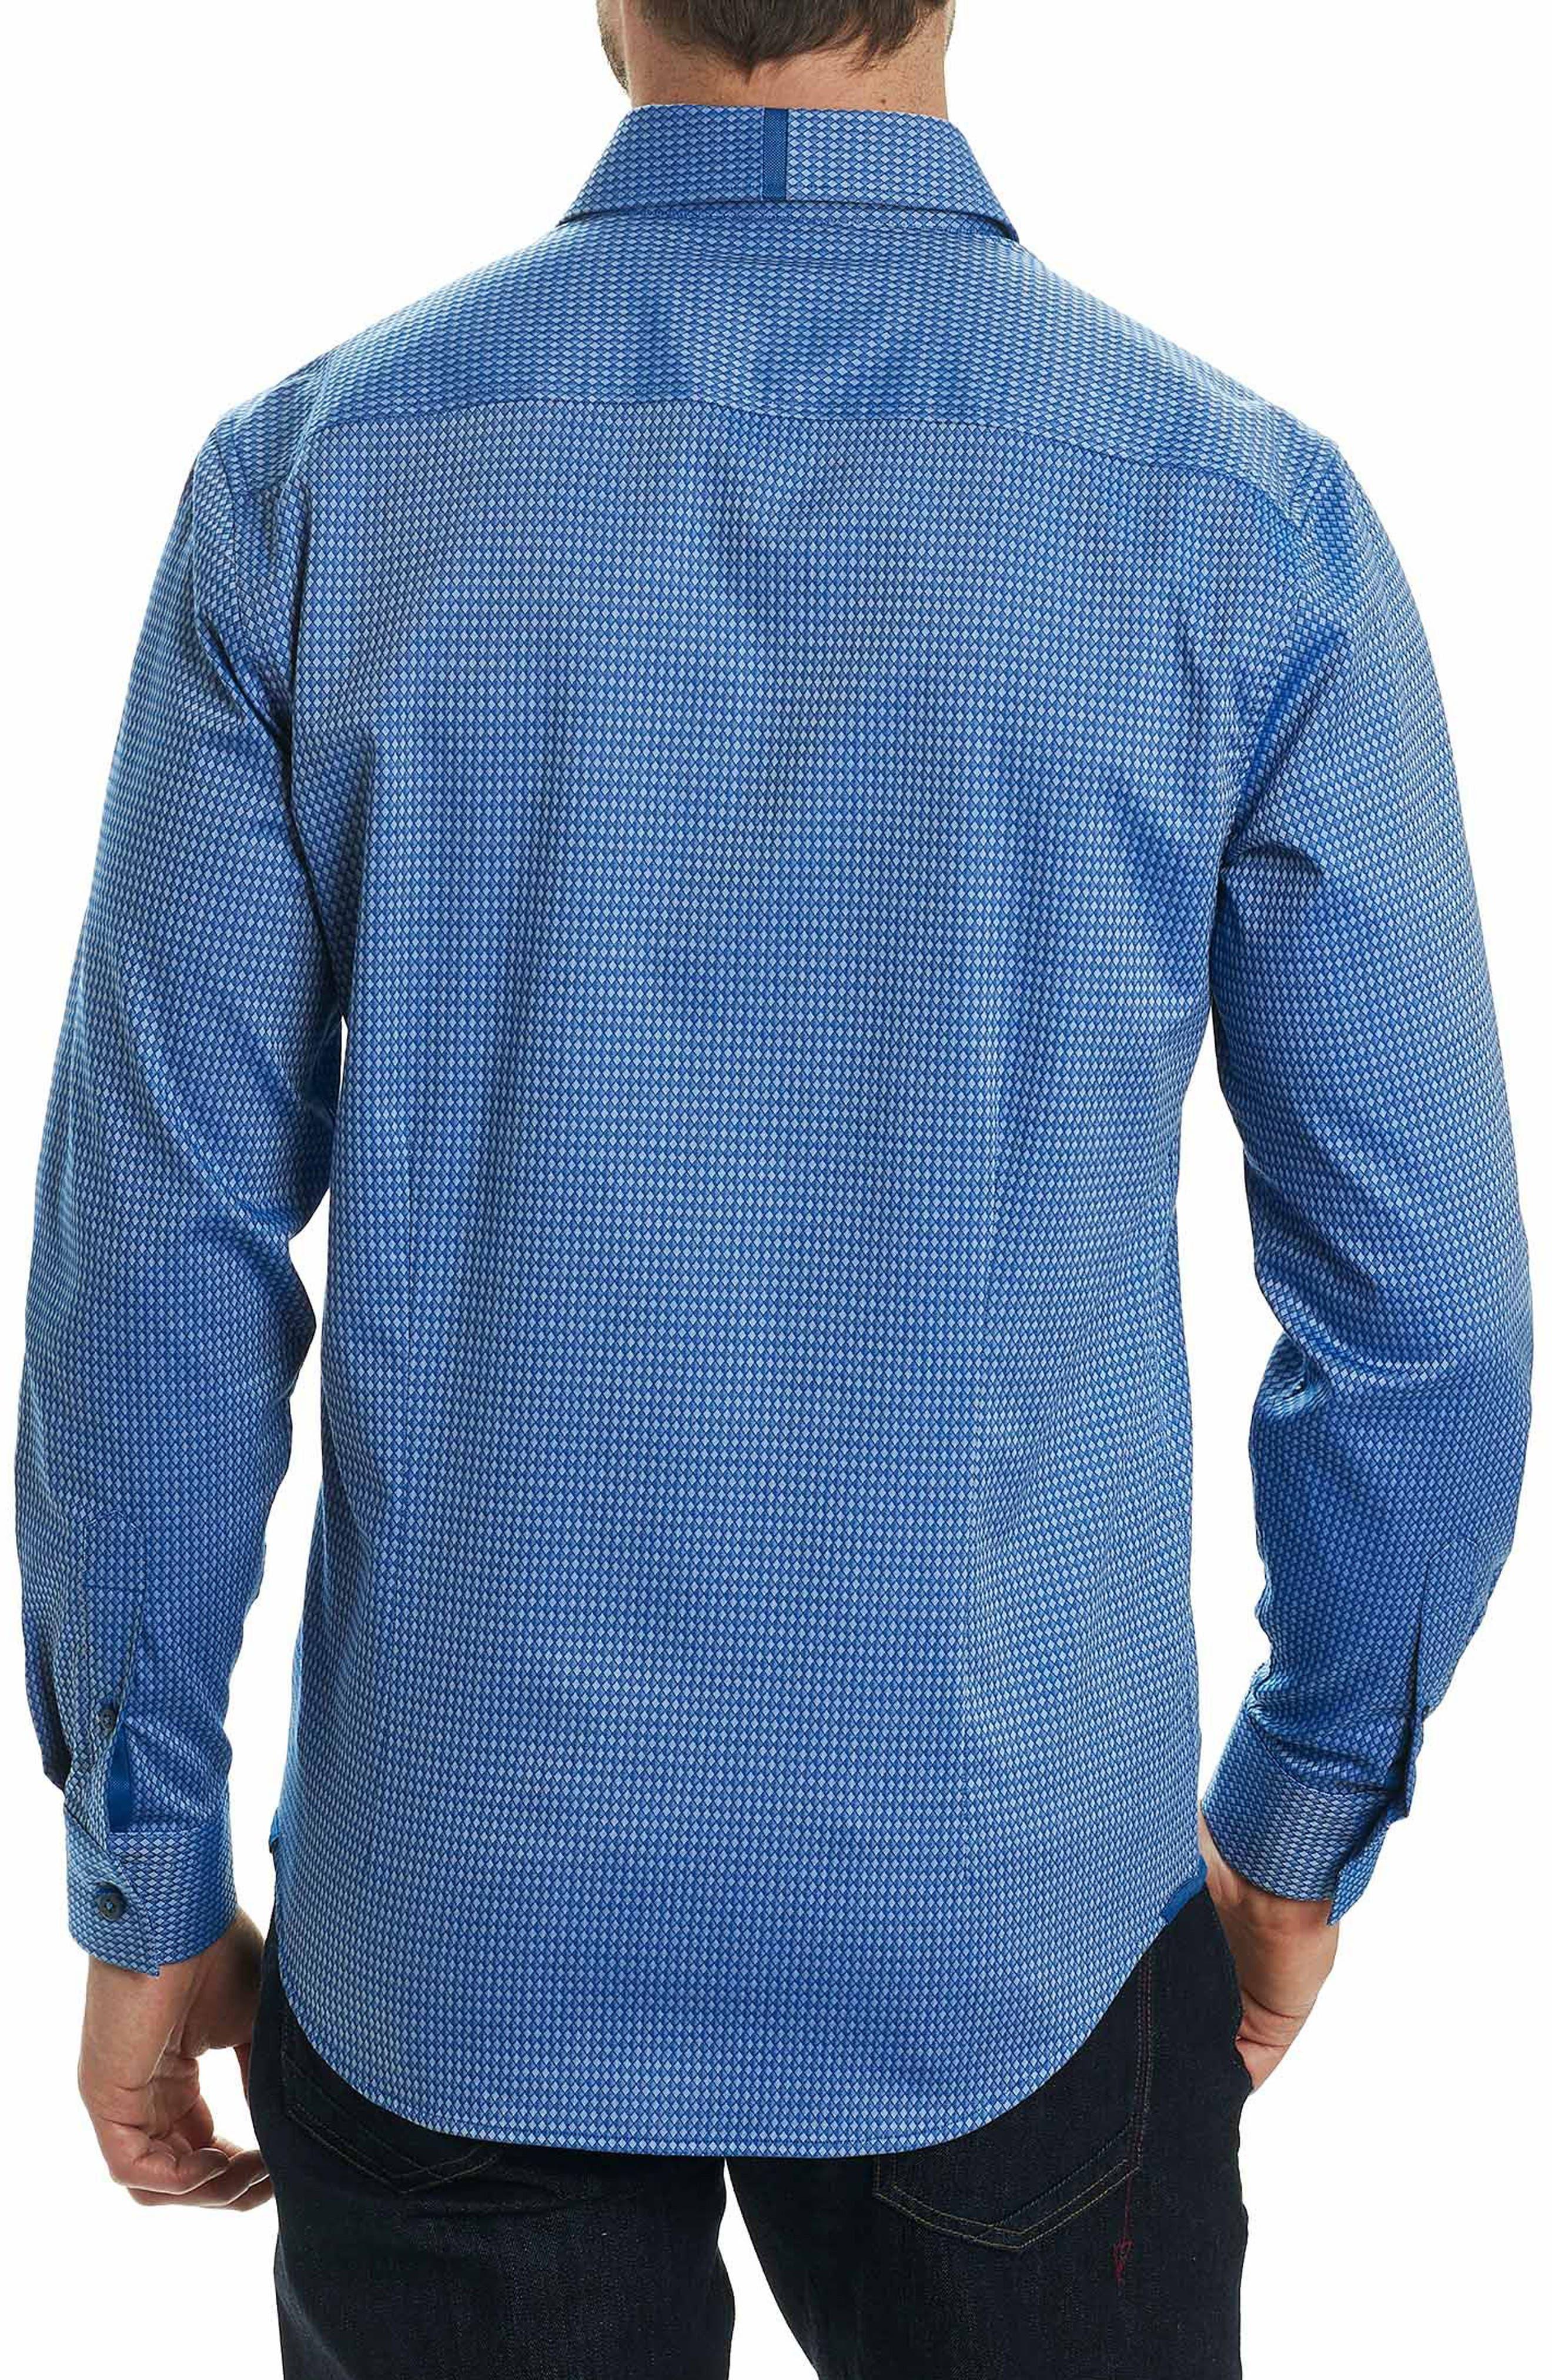 Matthew Tailored Fit Print Sport Shirt,                             Alternate thumbnail 2, color,                             410